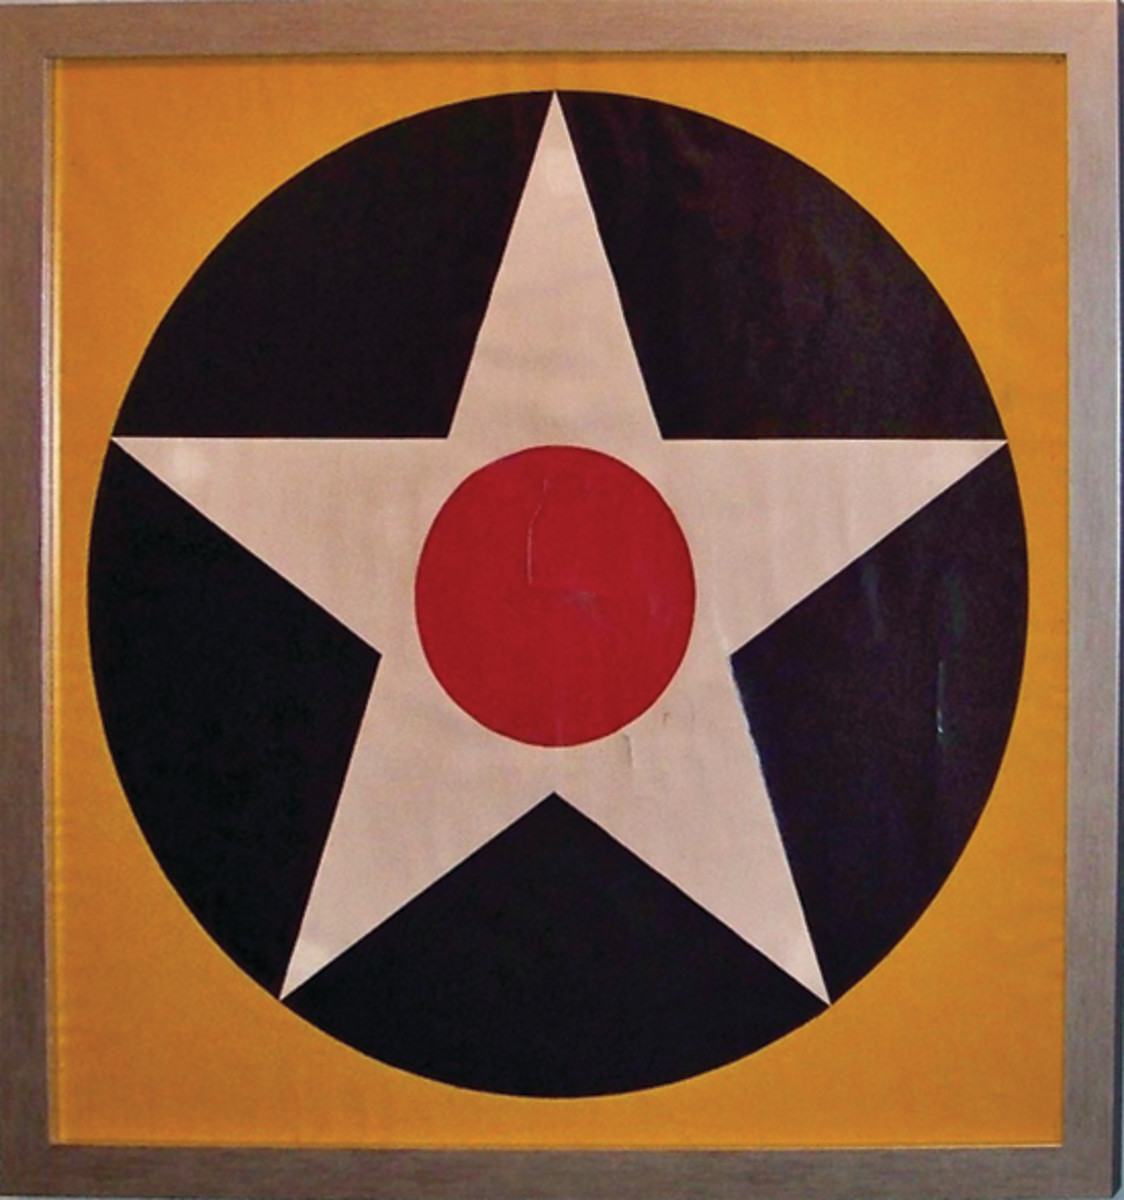 National Insignia Star cCweb